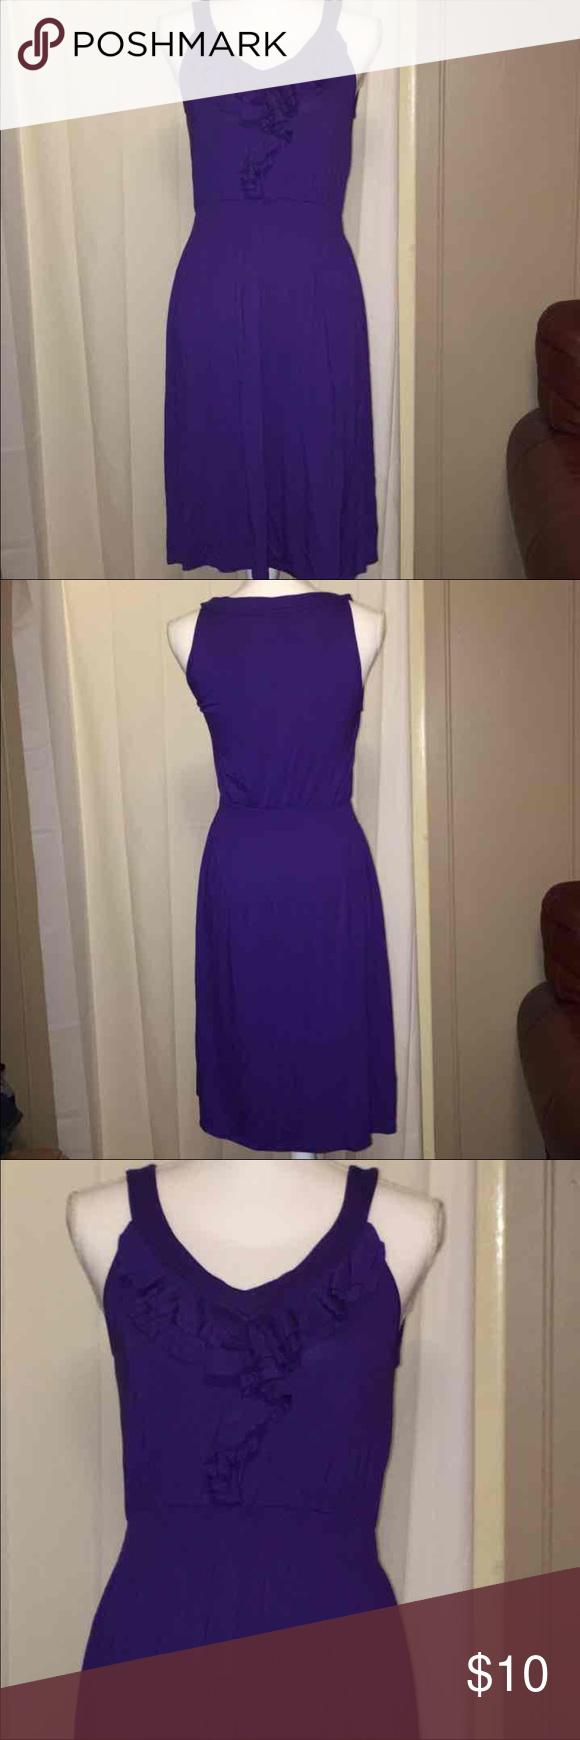 Huge sale spence boho ruffle grecian dress md | Purple dress ...